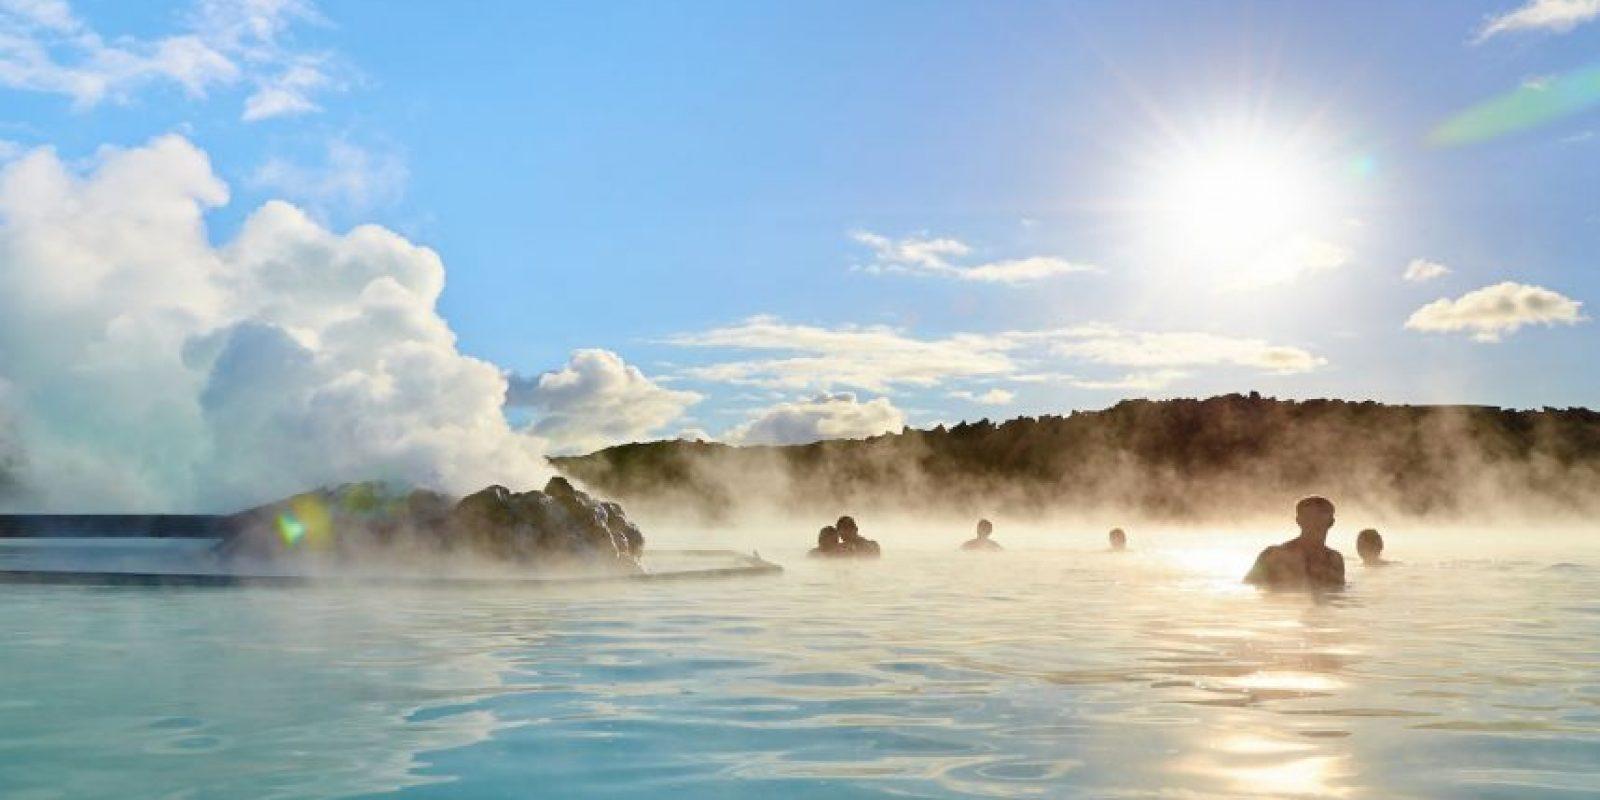 2. Islandia Foto:Flickr.com